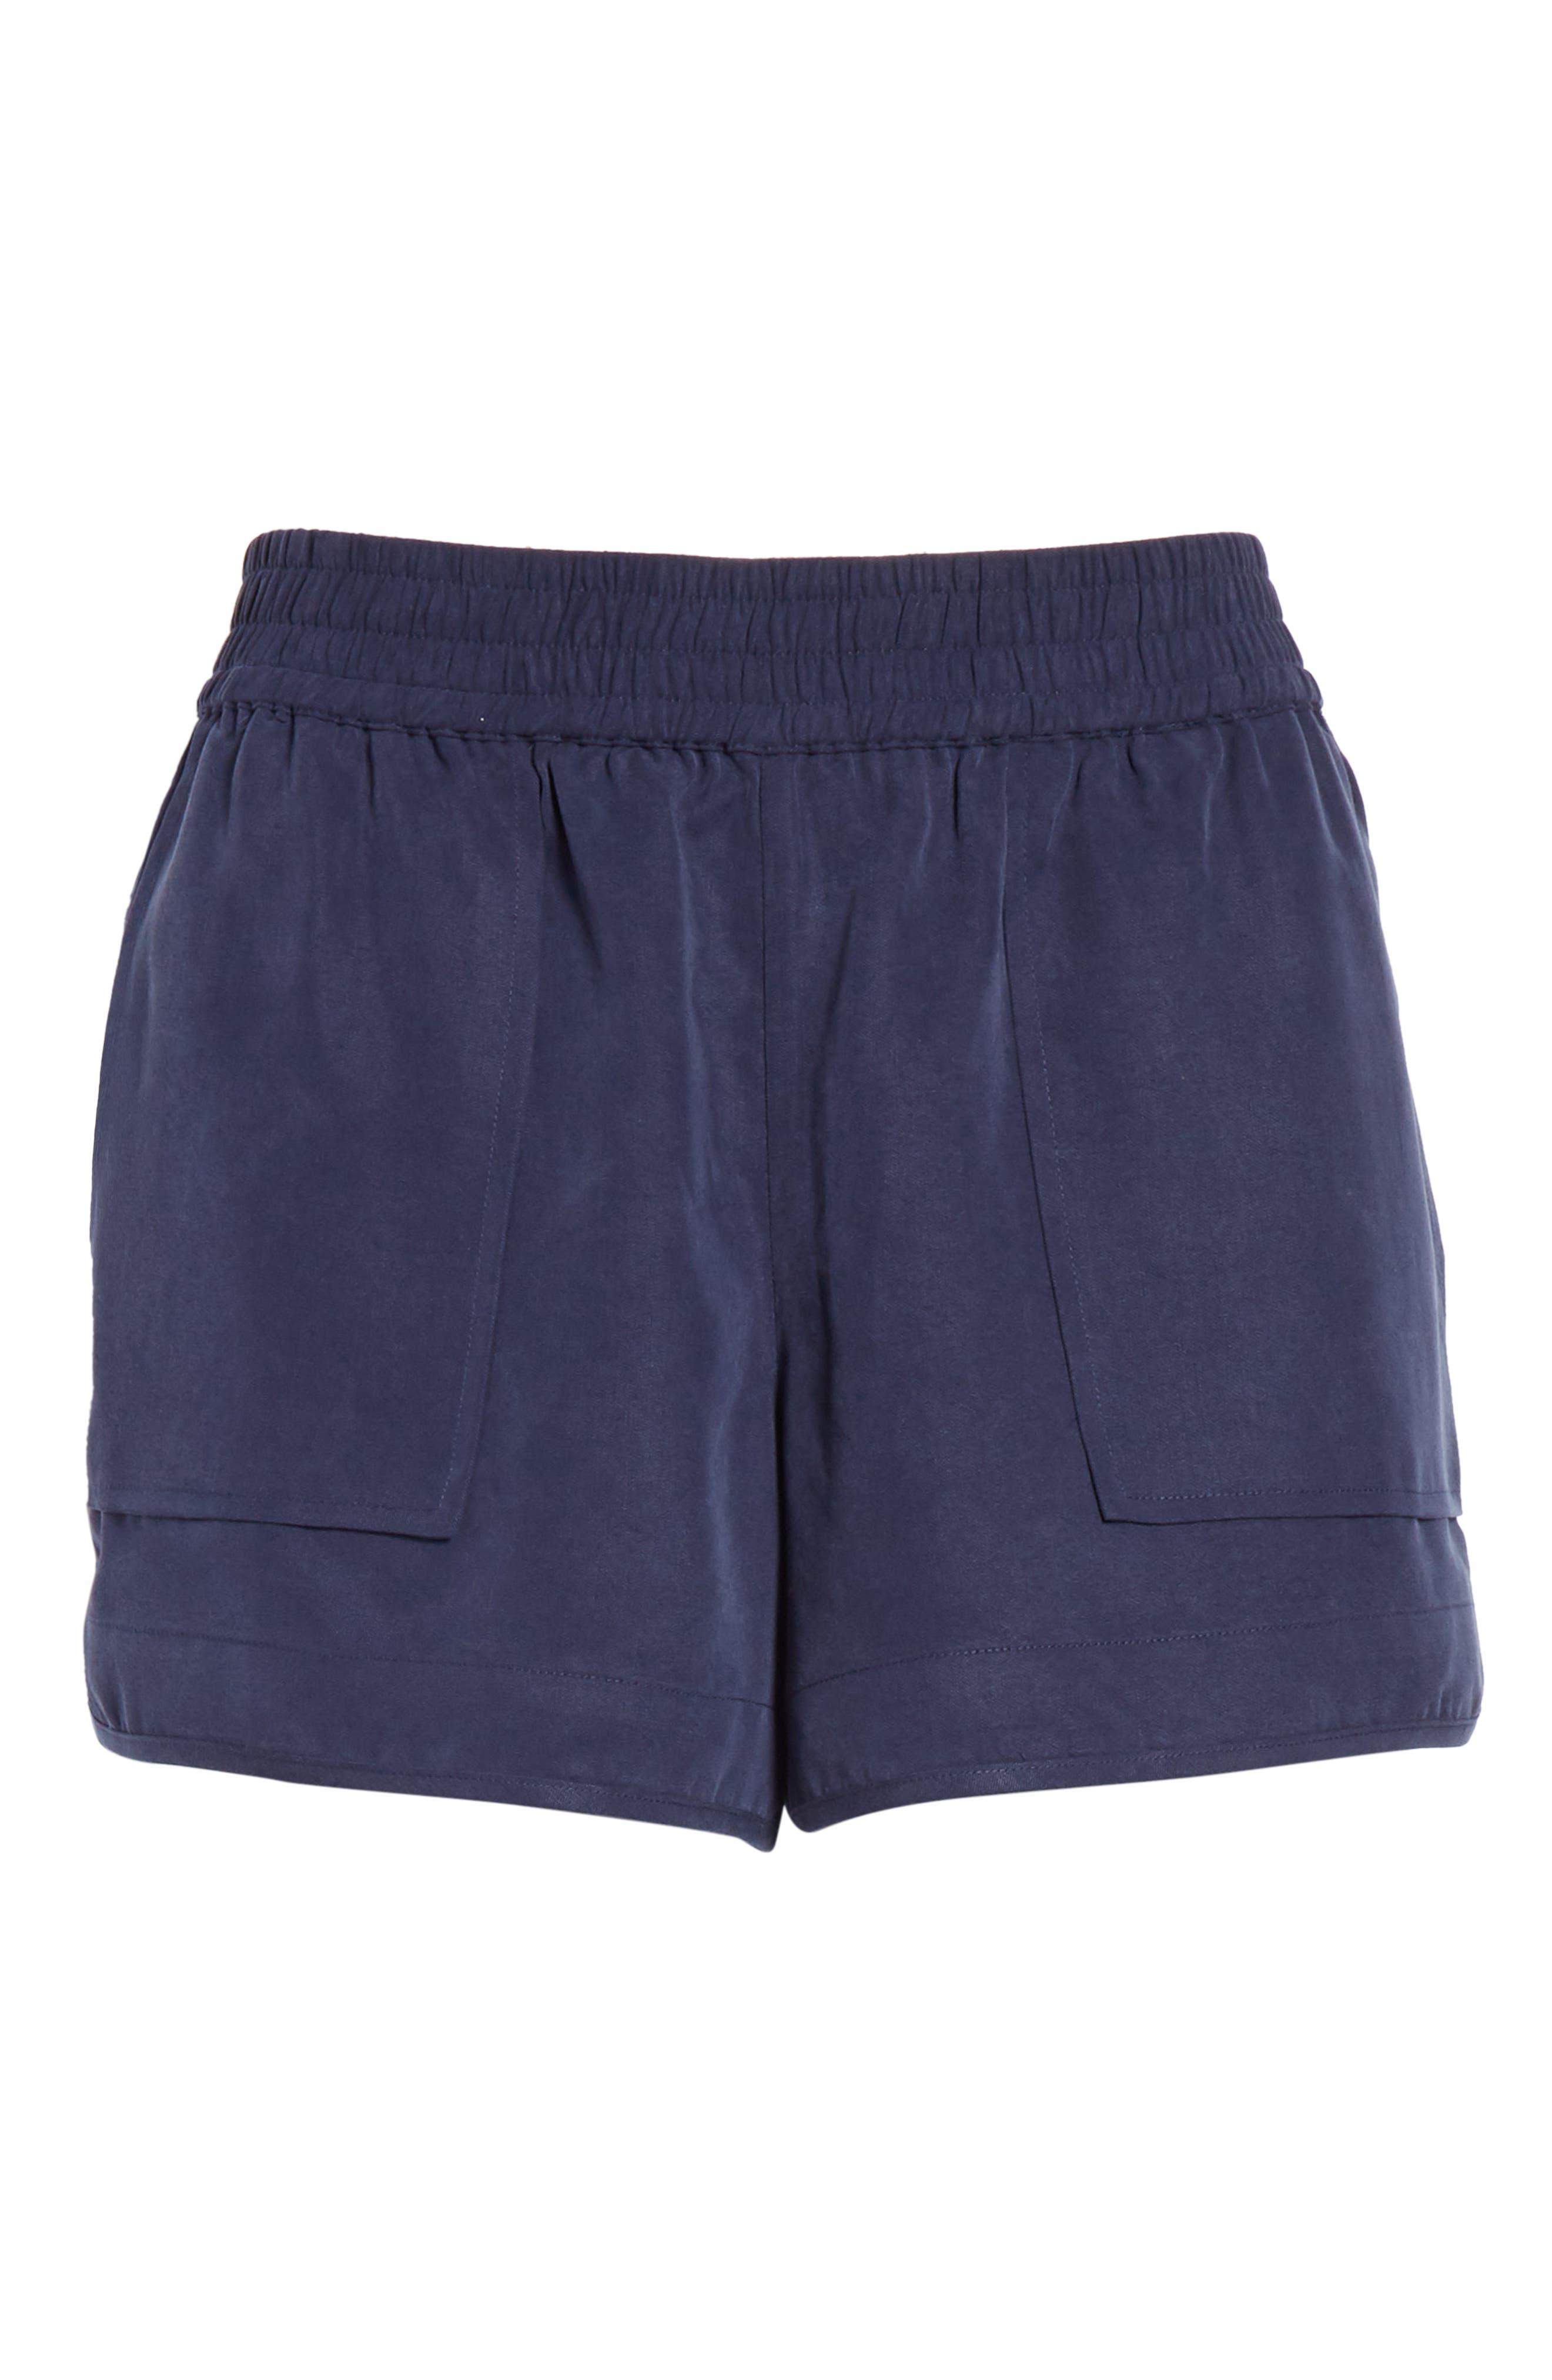 Beso Shorts,                             Alternate thumbnail 6, color,                             418